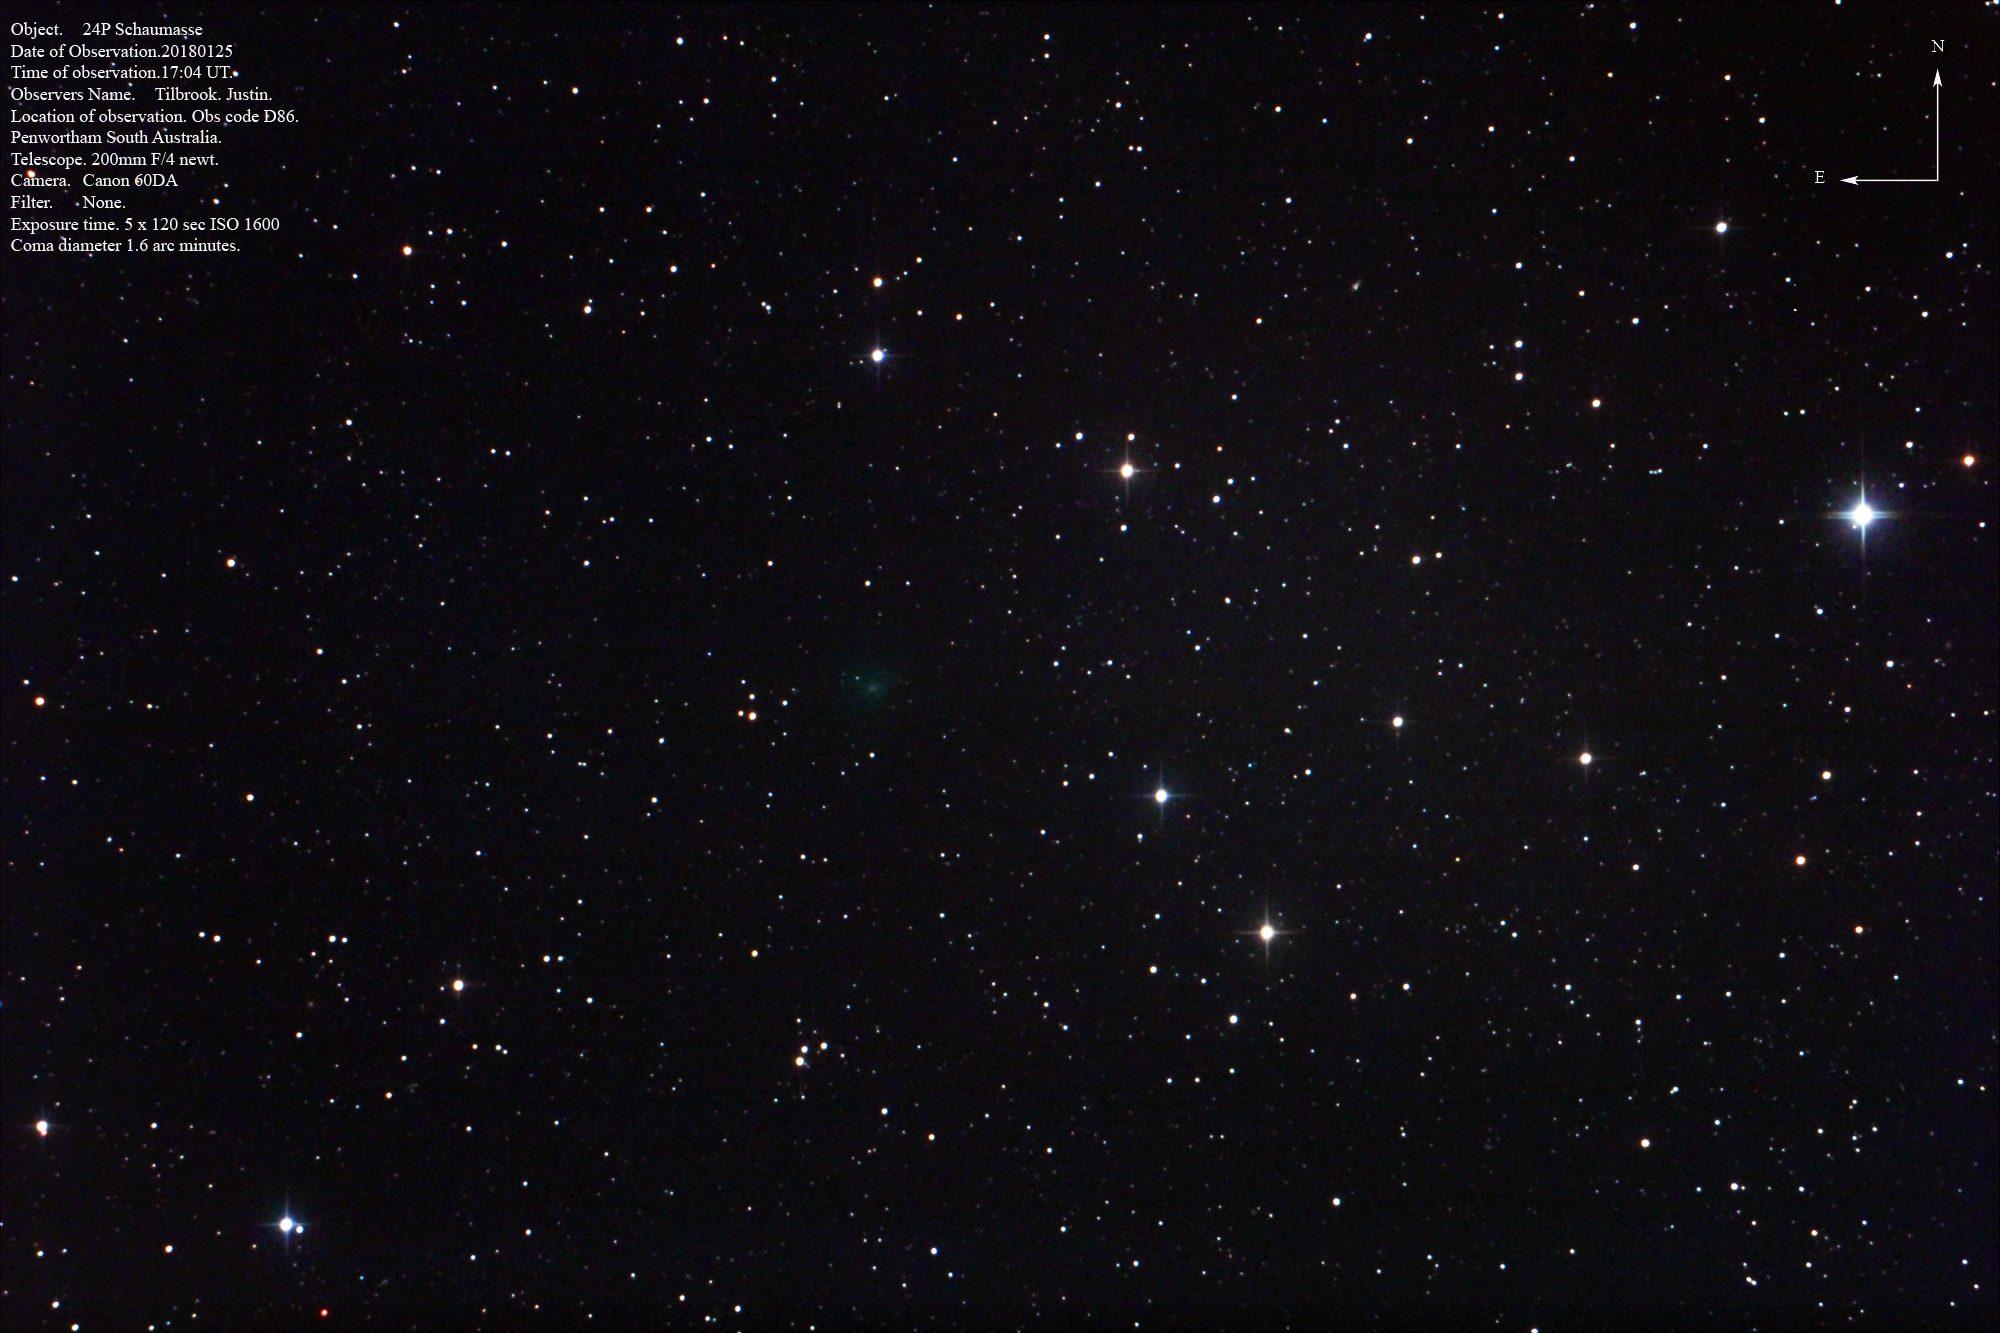 Cometa 24P/Schaumasse